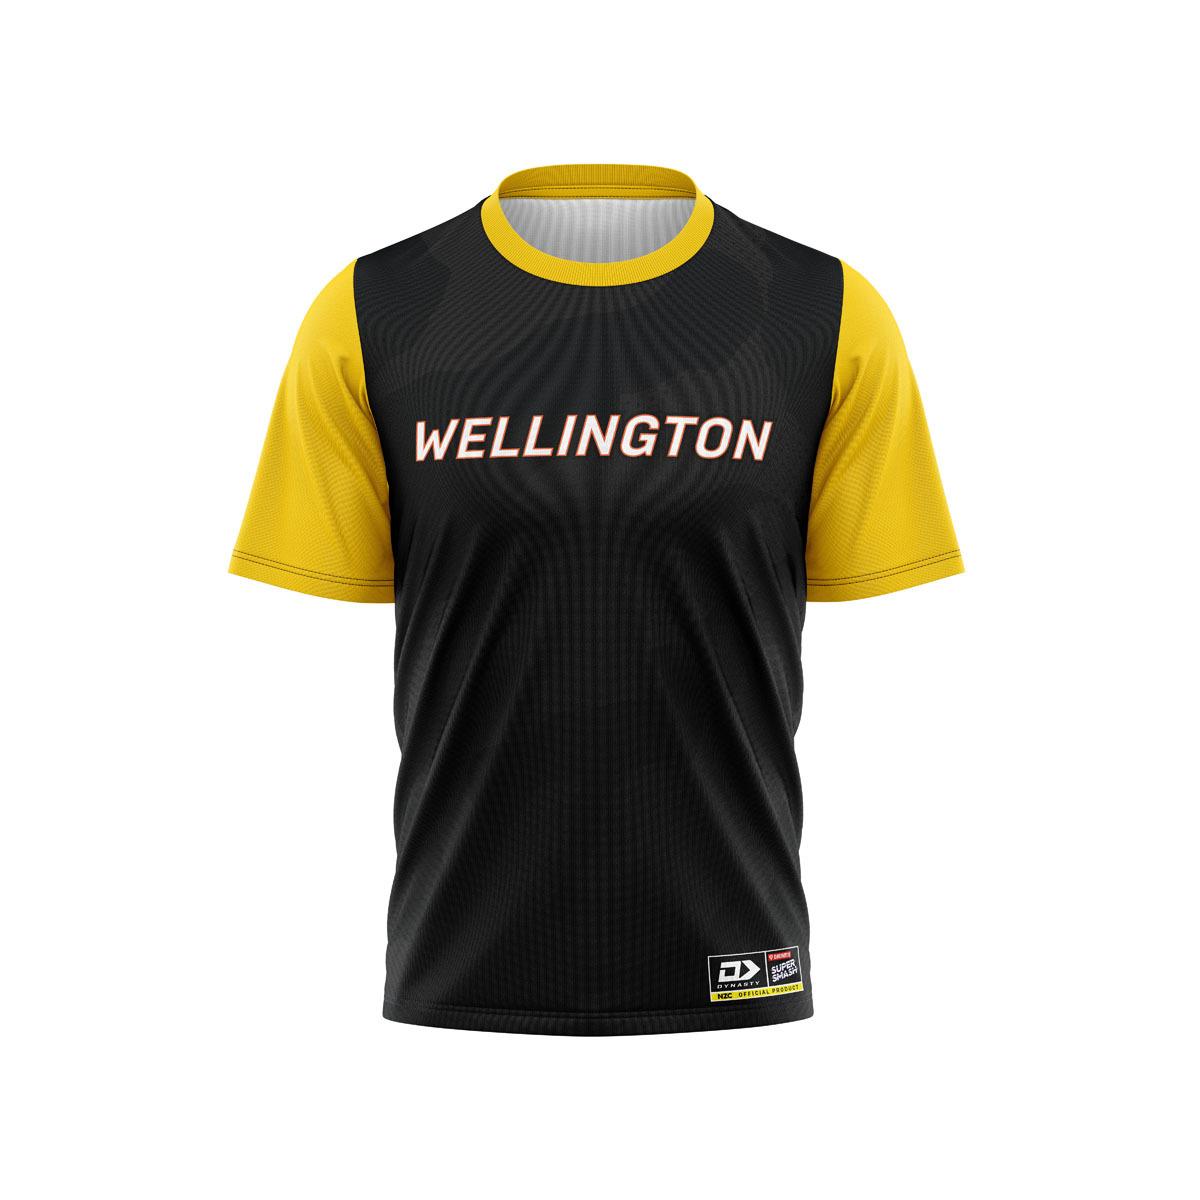 Wellington Firebirds Performance Tee (XL) image